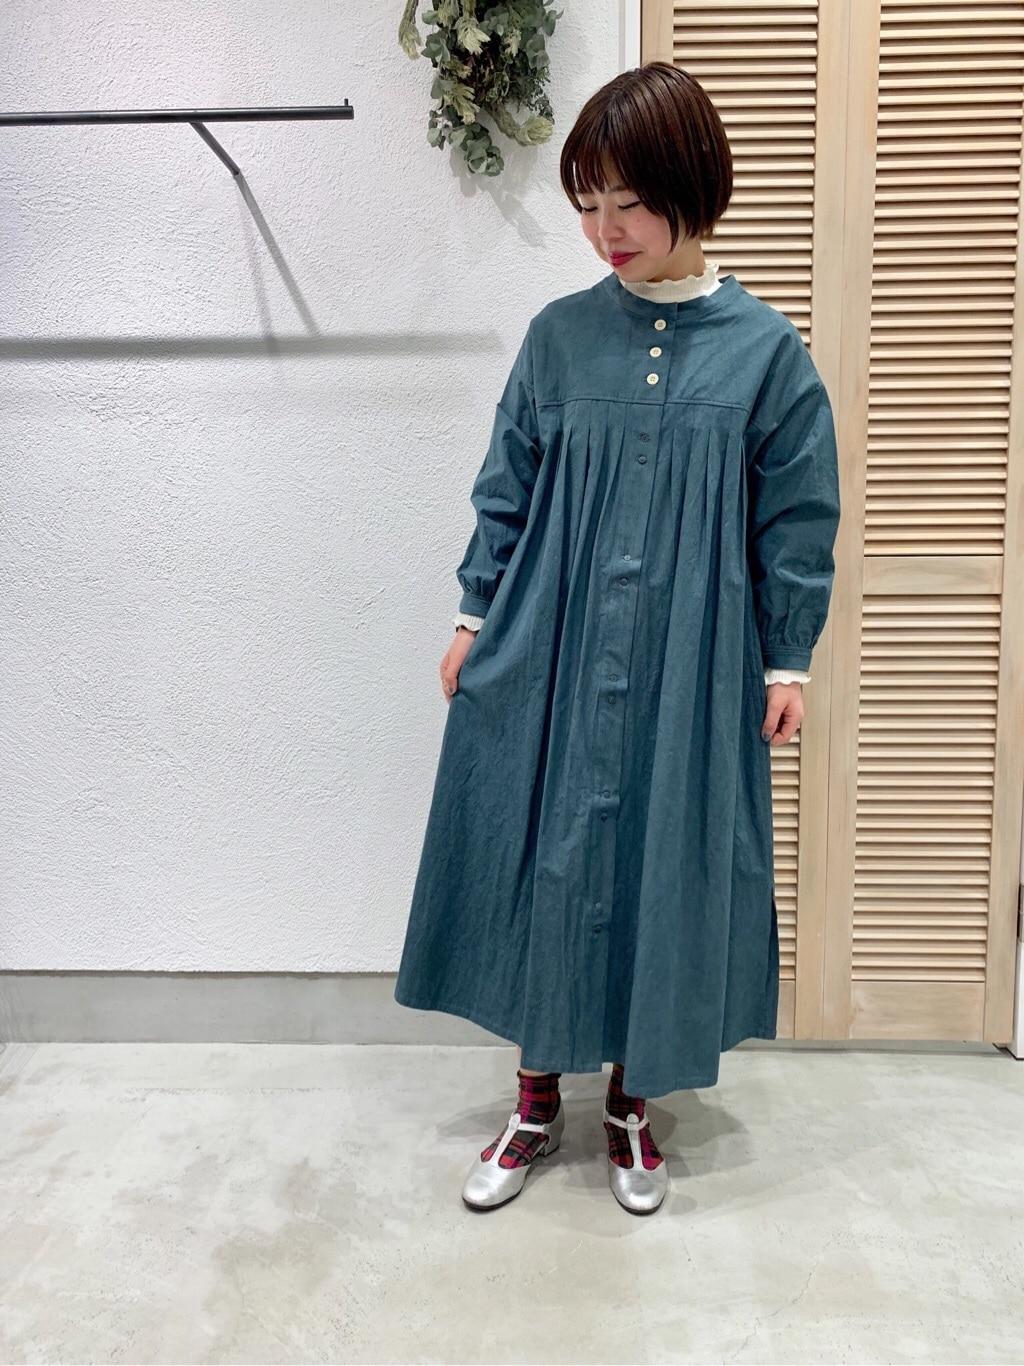 chambre de charme 横浜ジョイナス 身長:153cm 2020.02.21